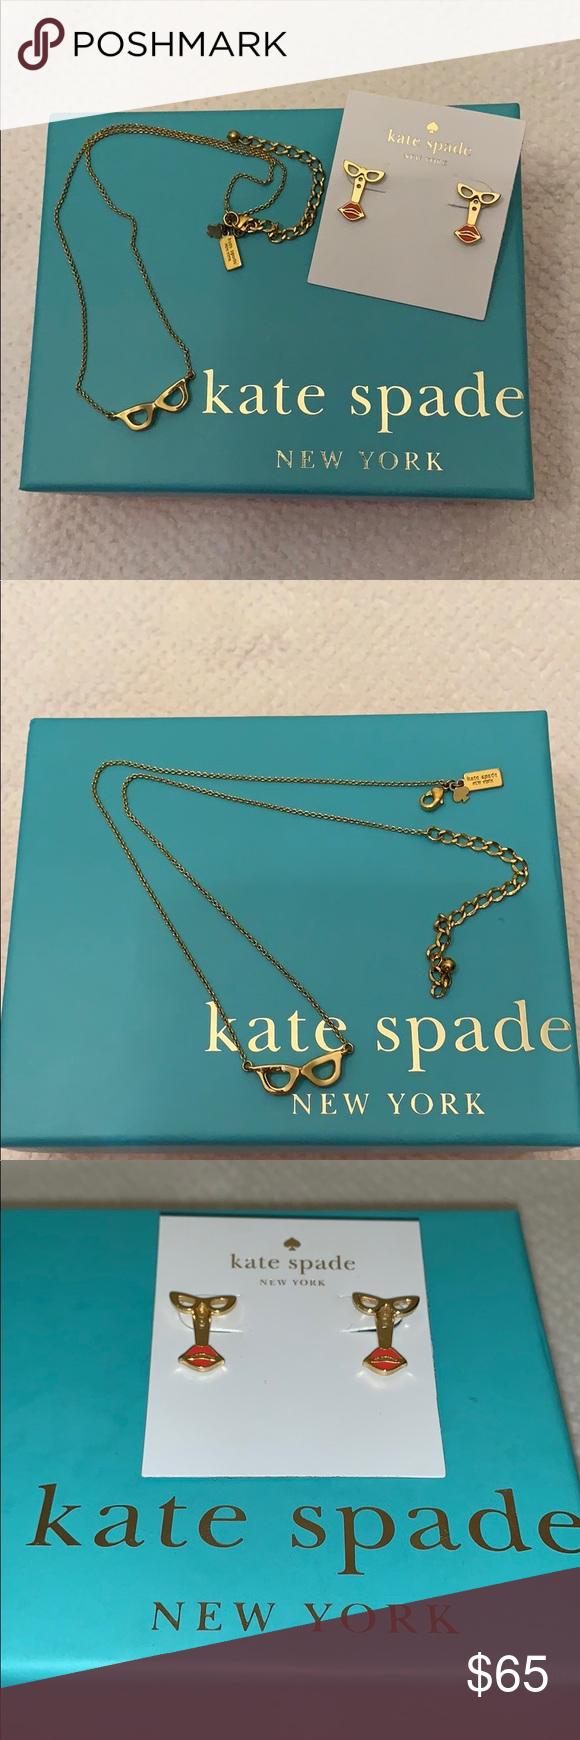 18b9675c4ef9e Kate Spade Goreski Glasses set Gold Kate Spade Lookout Goreski ...